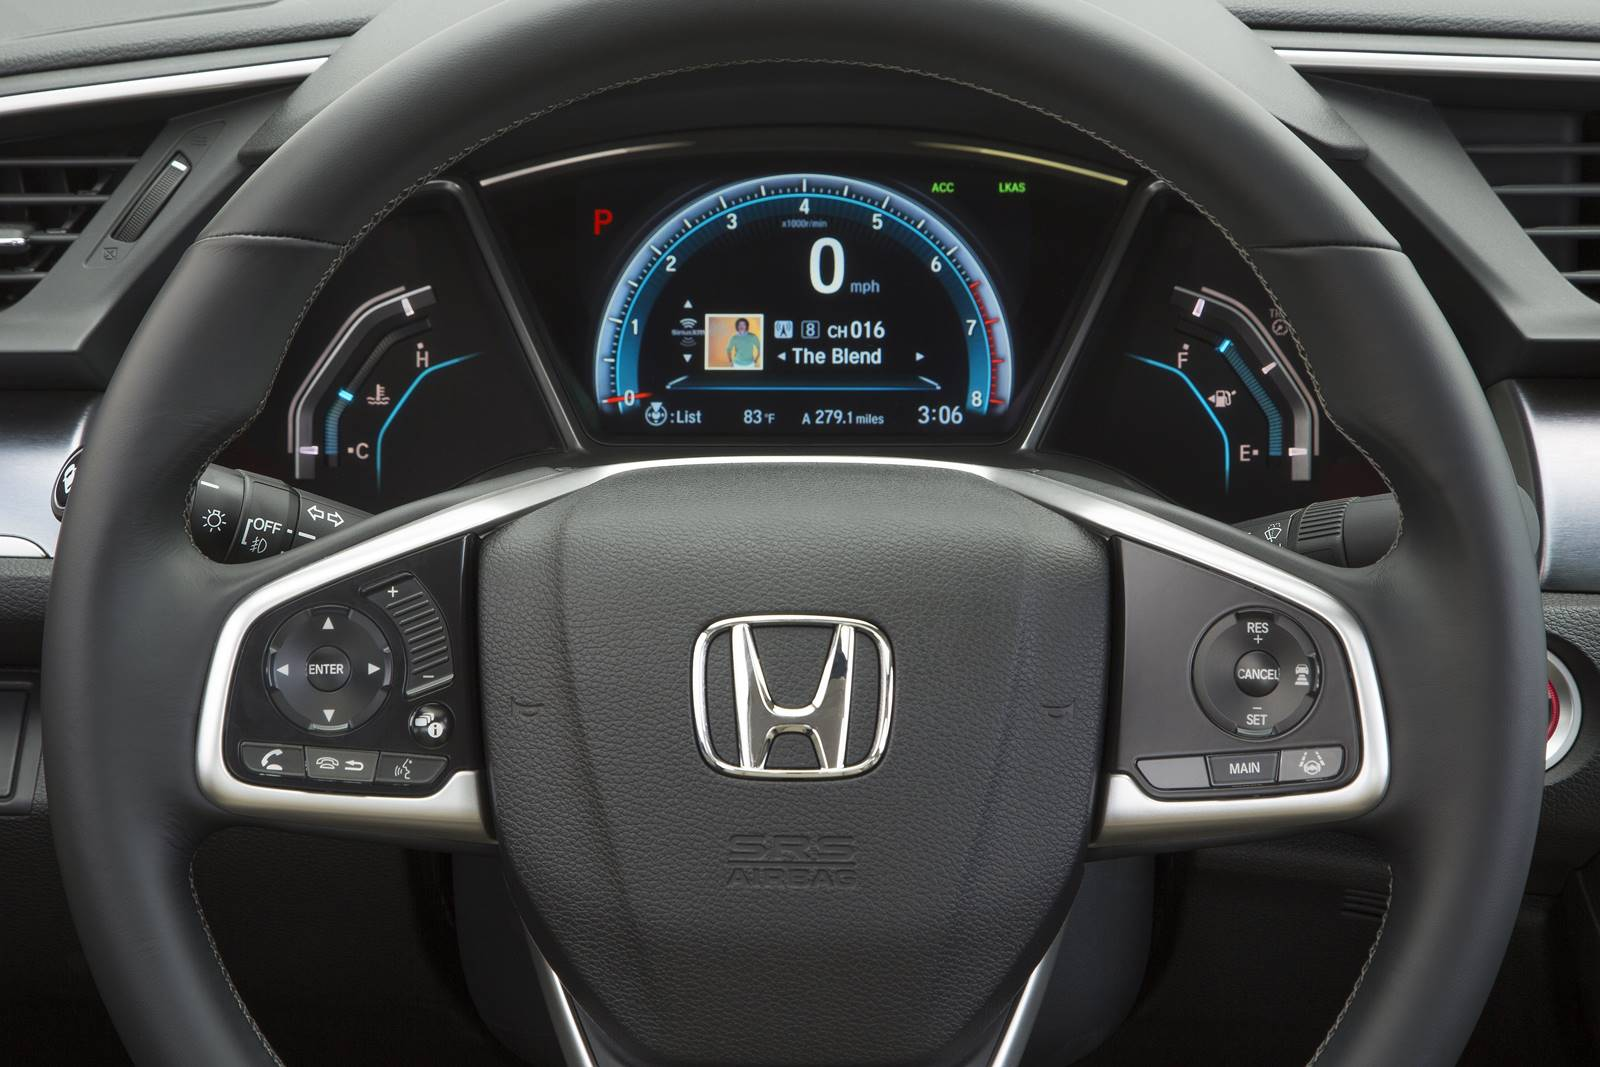 Novo Honda Civic 2017 x Novo Cruze 2017